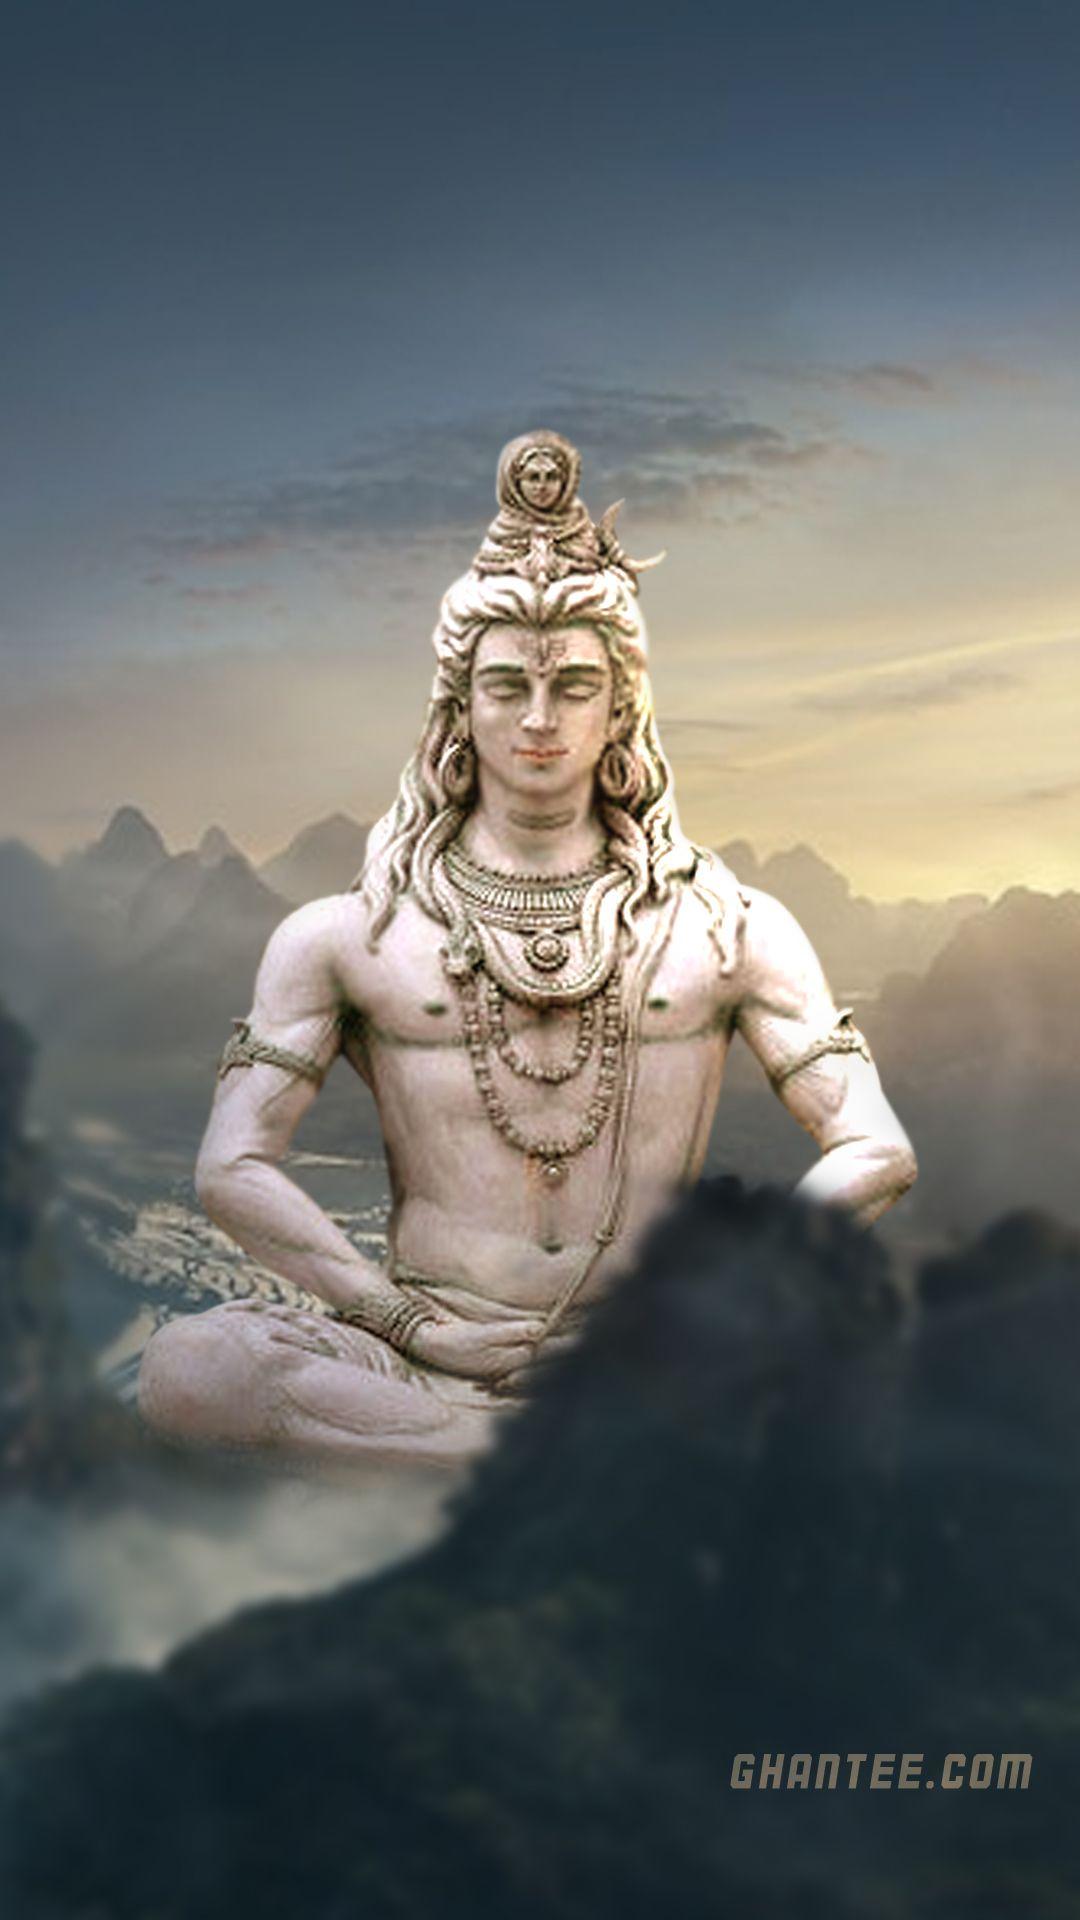 Lord Shiva Giant Meditating Statue Wallpaper Lord Shiva Hd Wallpaper Lord Shiva Mahadev Hd Wallpaper Full hd lord siva images hd 1080p